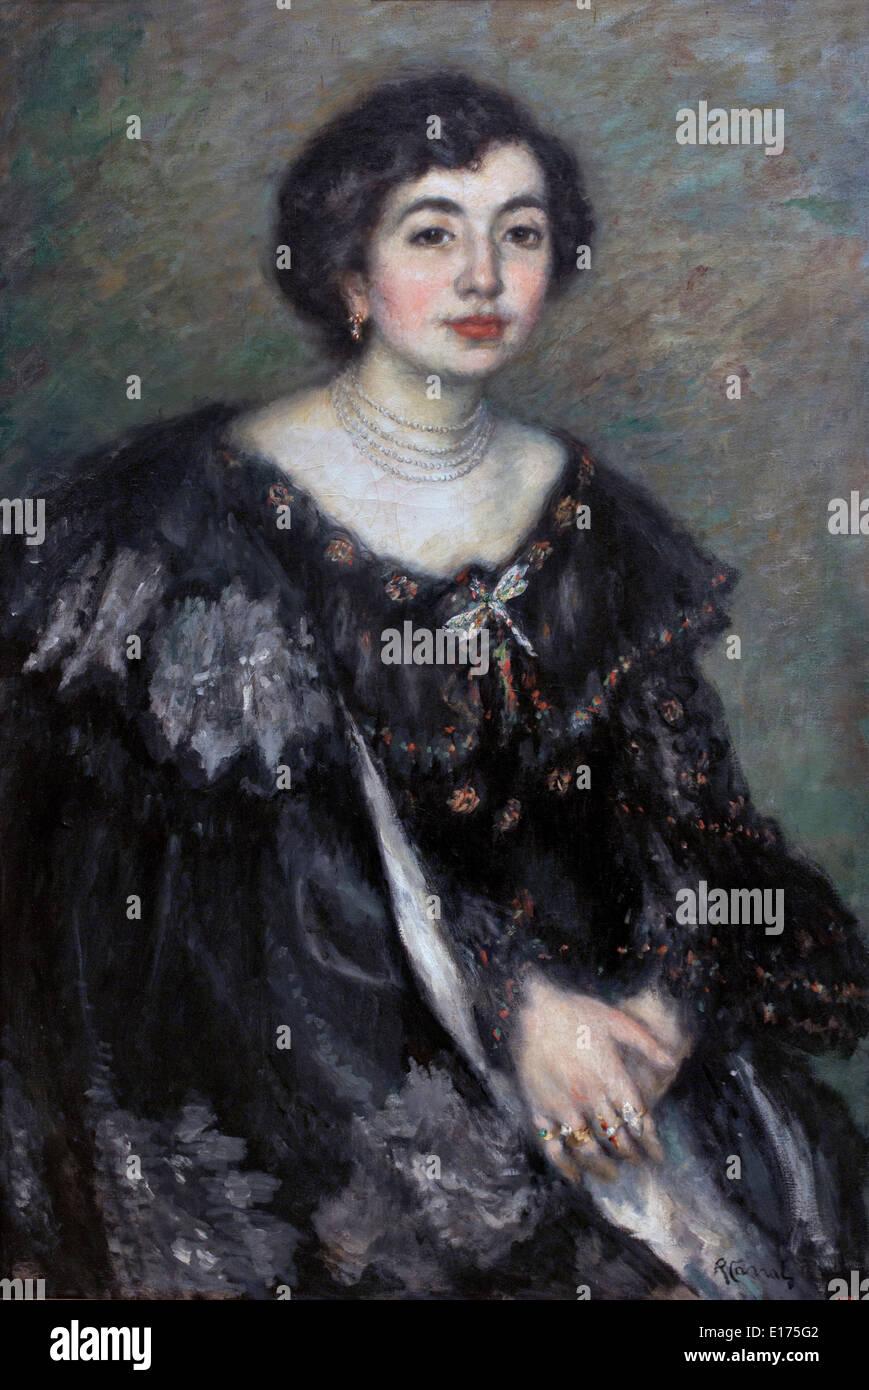 Portrait of Senyora Amouroux, the Artist's Sister-in-Law Portrait of Senyora Amouroux, Ricard Canals 1876-1931 - Stock Image